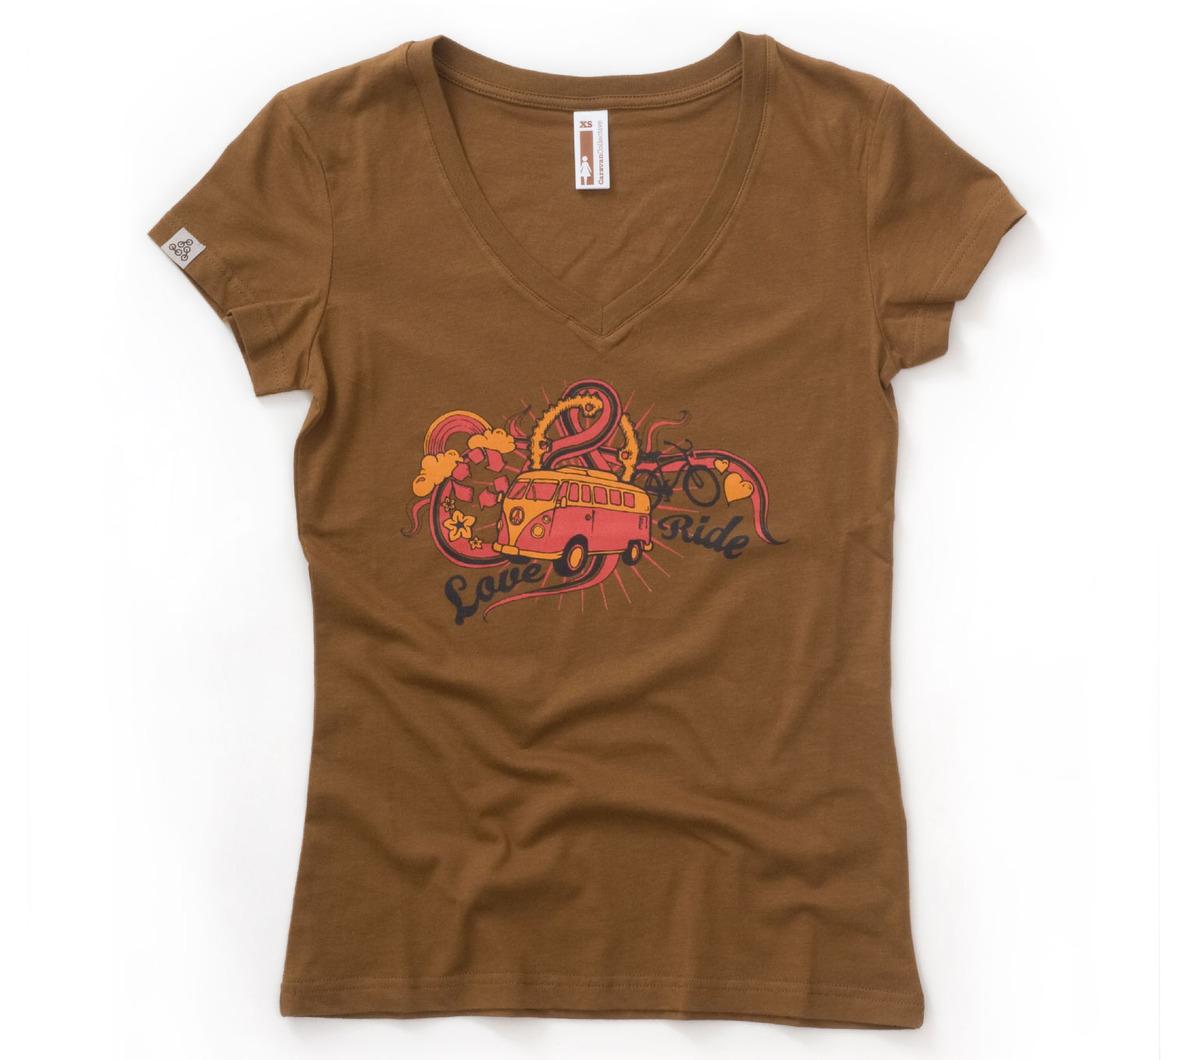 new women 100 organic cotton t shirt brown v neck graphic girls tee size xs xxl ebay. Black Bedroom Furniture Sets. Home Design Ideas